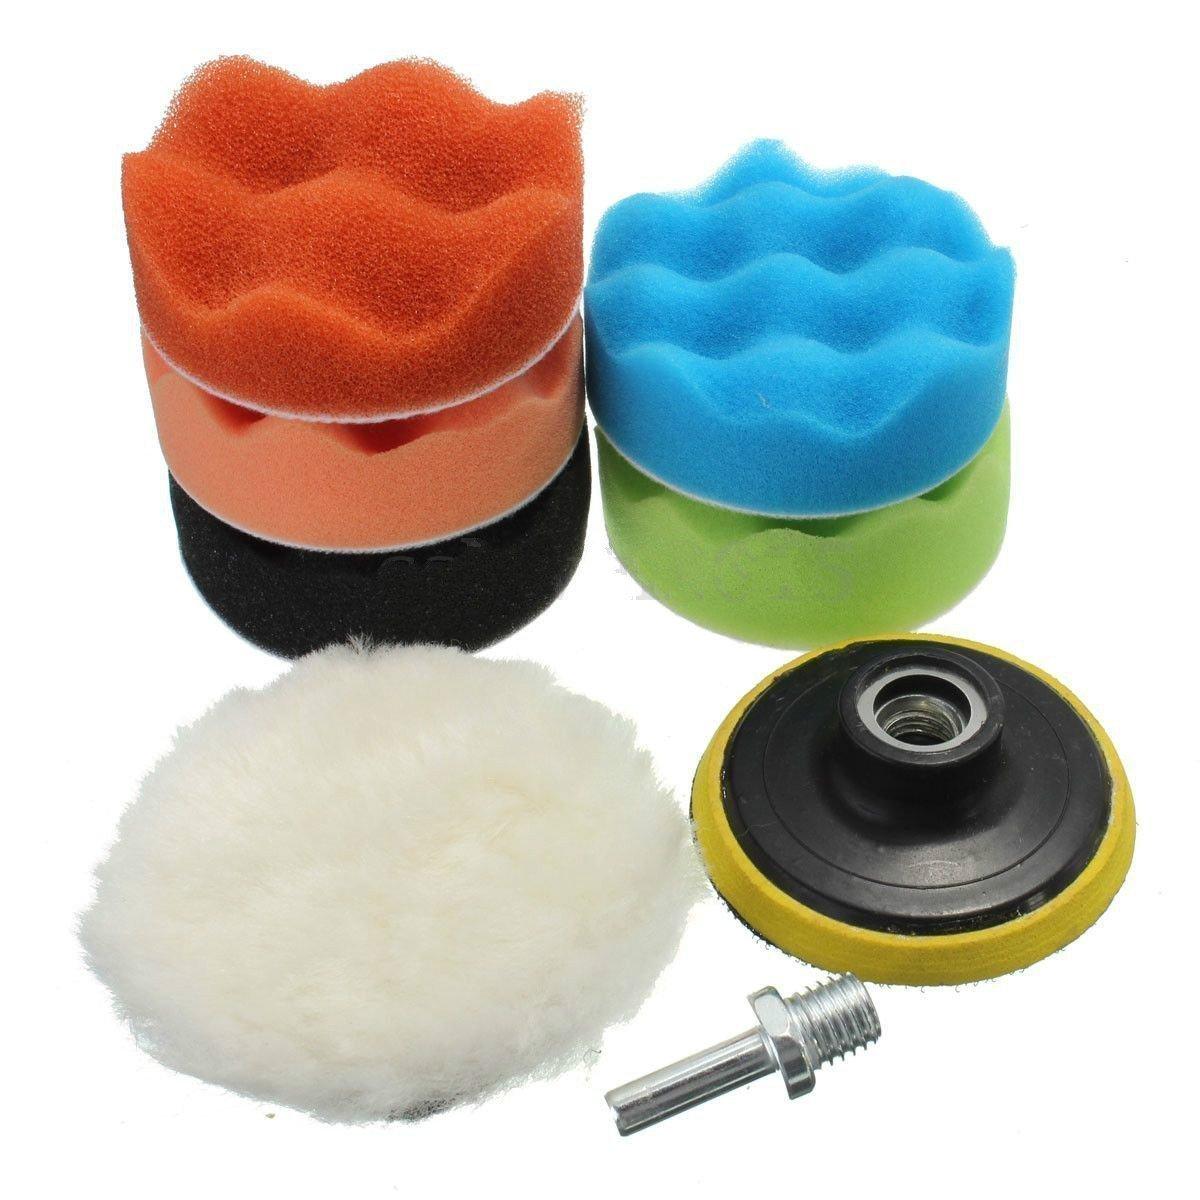 19Pcs Sponge Buffing Buffer Pad Polishing Waxing Kit Set Auto Car Polisher(M10 Drill Adapter) Yosoo LEPAZA58099